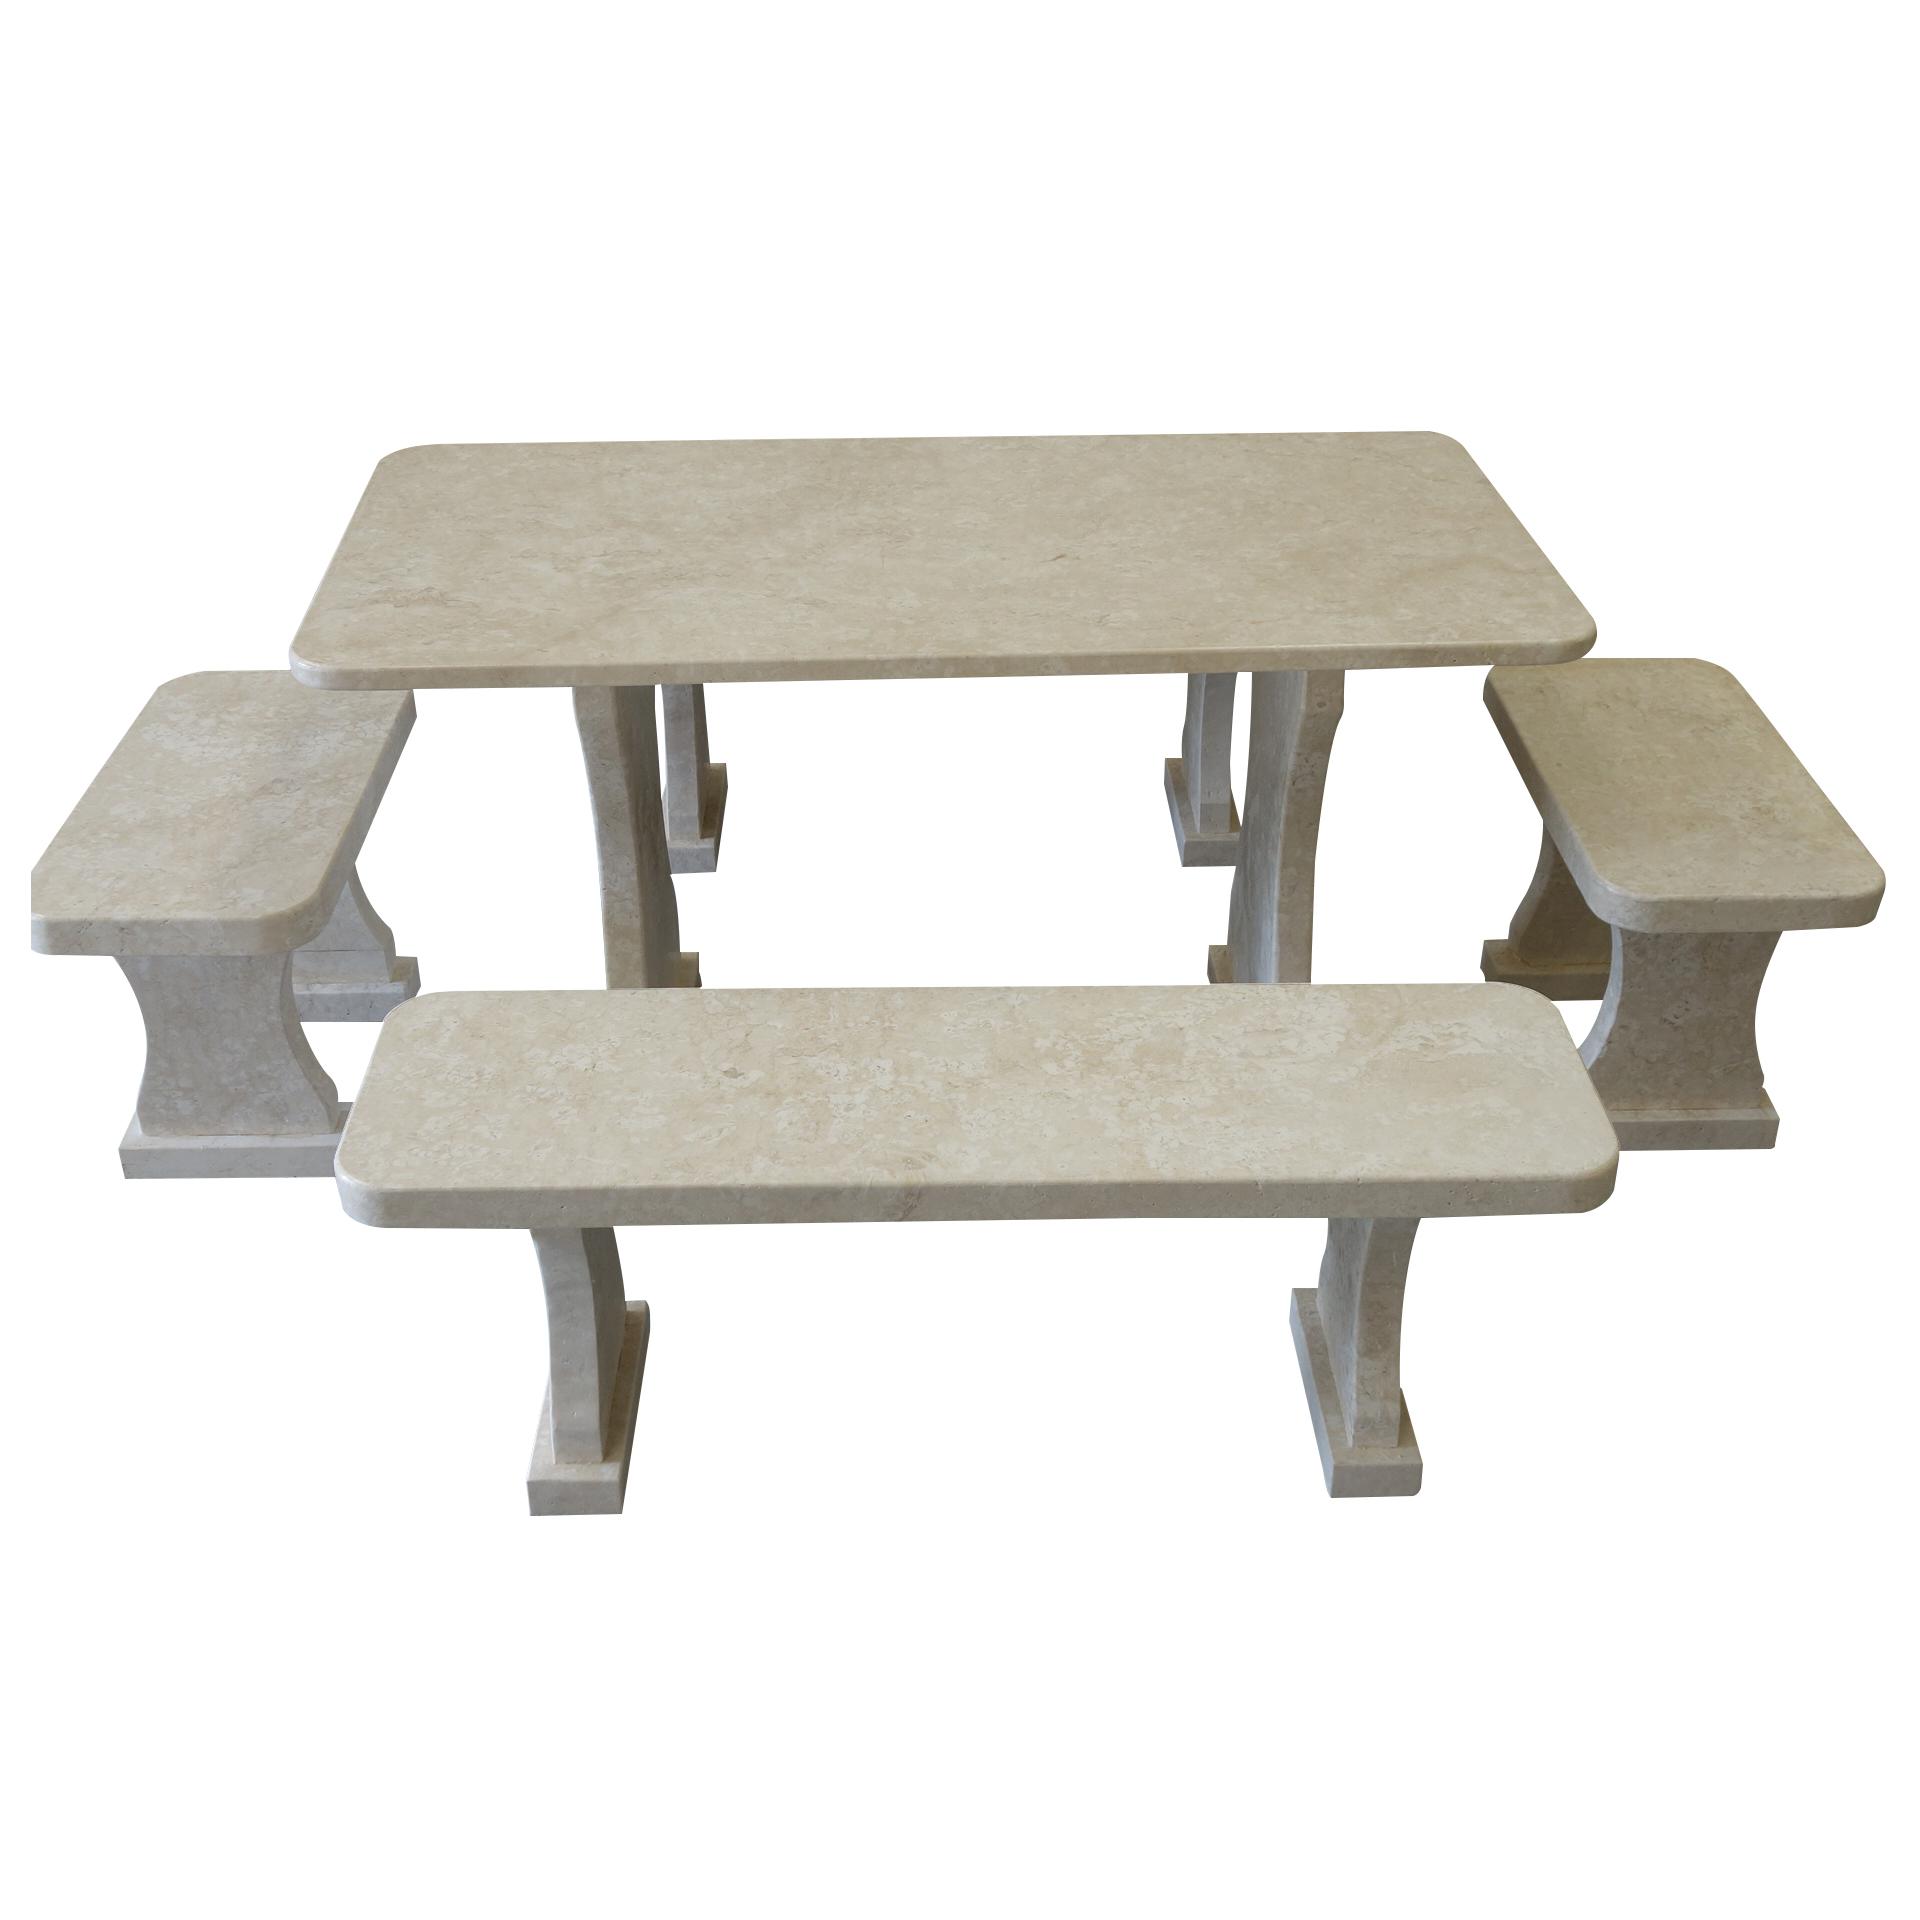 Garden White Stone Table and set of benches TA-003 2